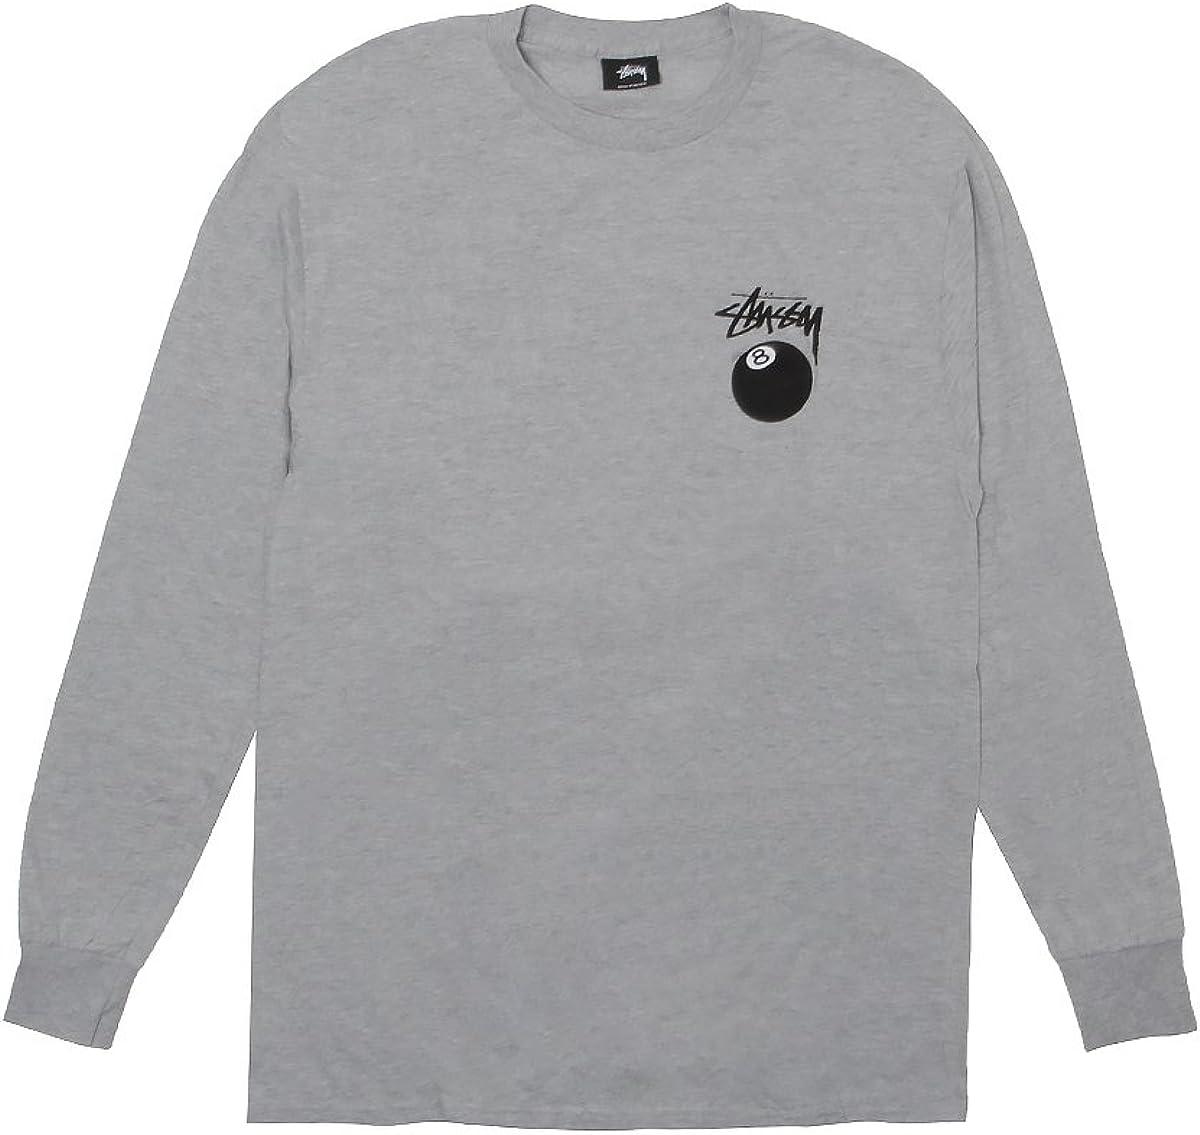 Stussy 8 Ball 1993759-ghea camiseta de manga larga para hombre gris Heather: Amazon.es: Ropa y accesorios